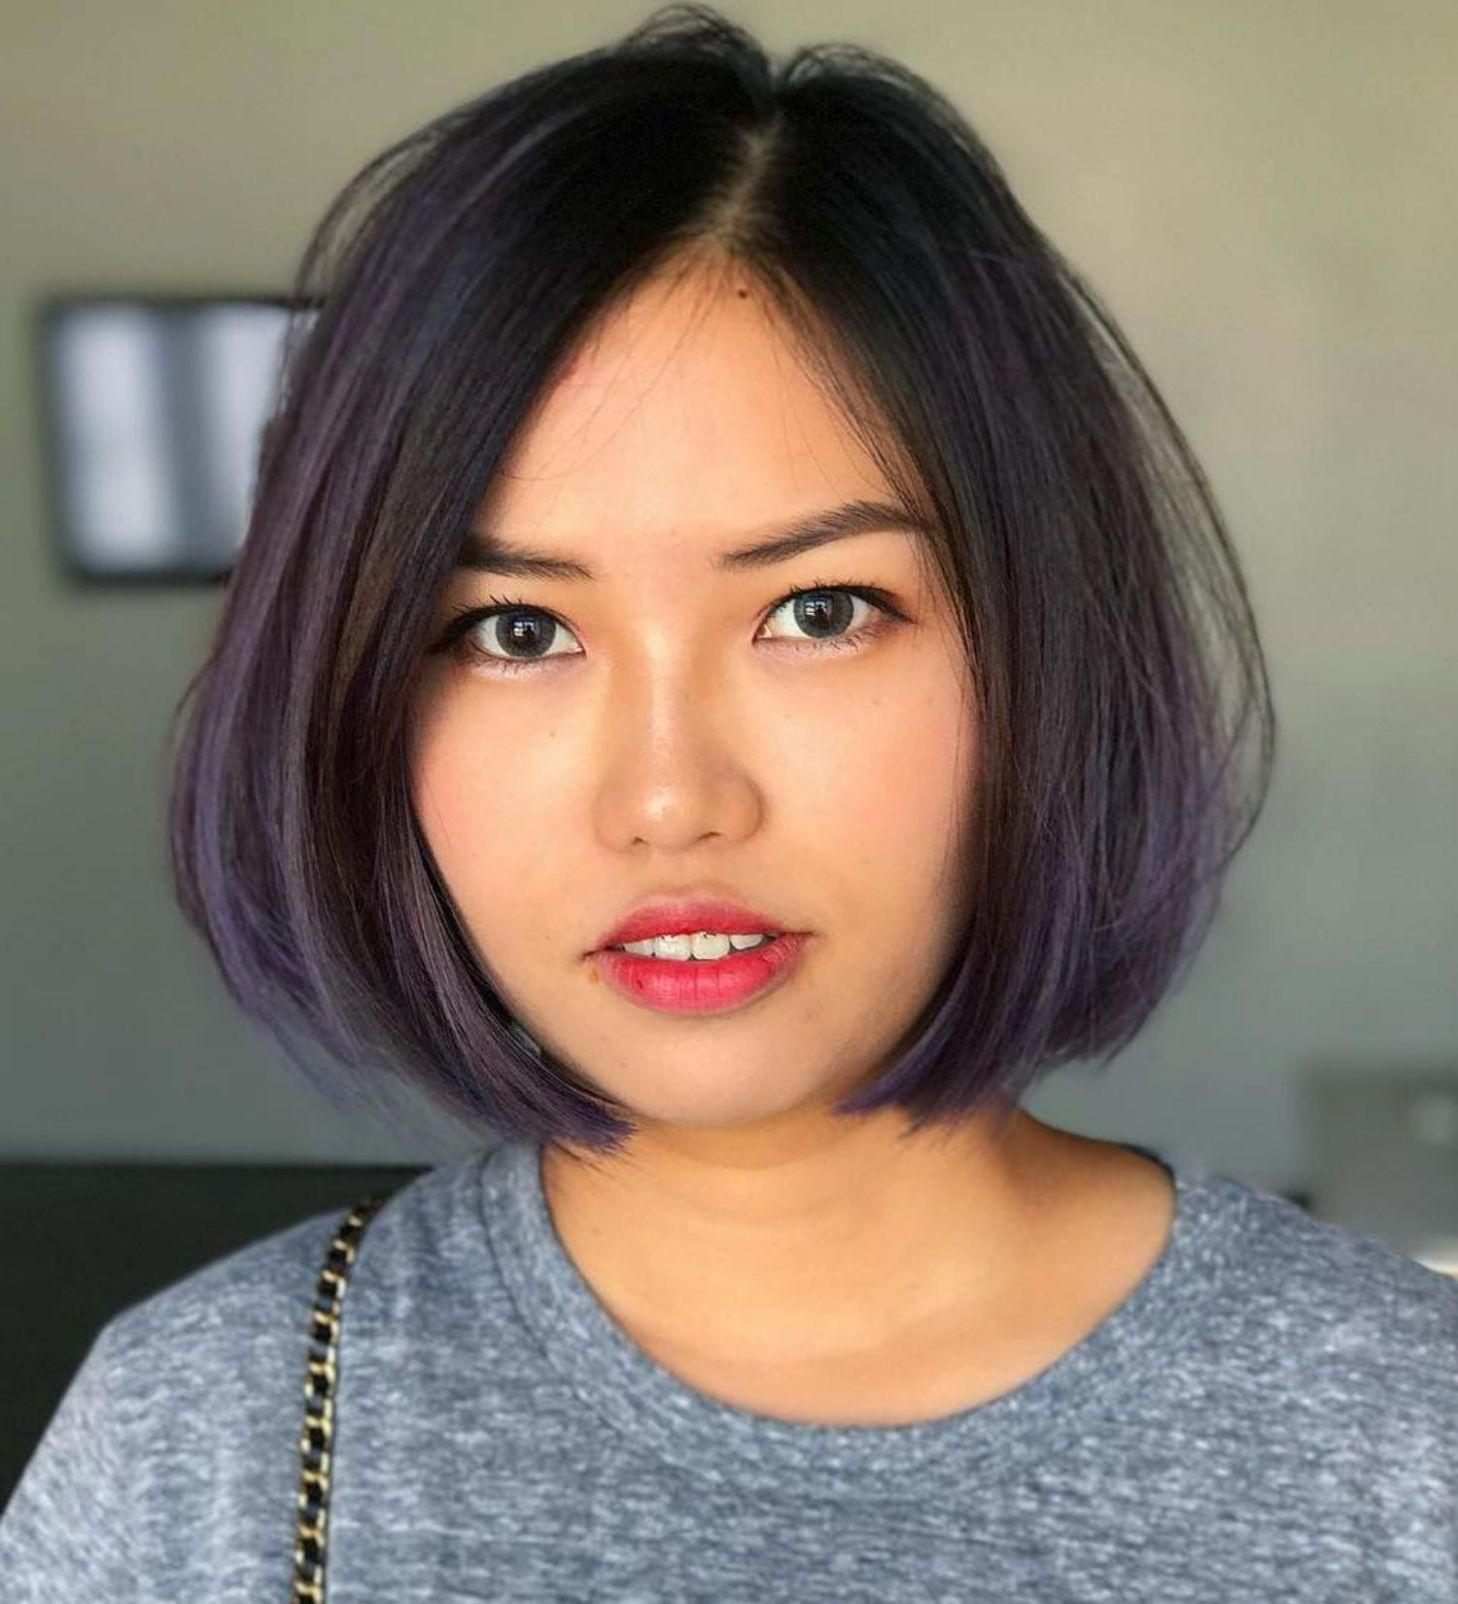 Chin-Length A-Line Bob | Short hair styles for round faces, Hairstyles for round faces, Short ...